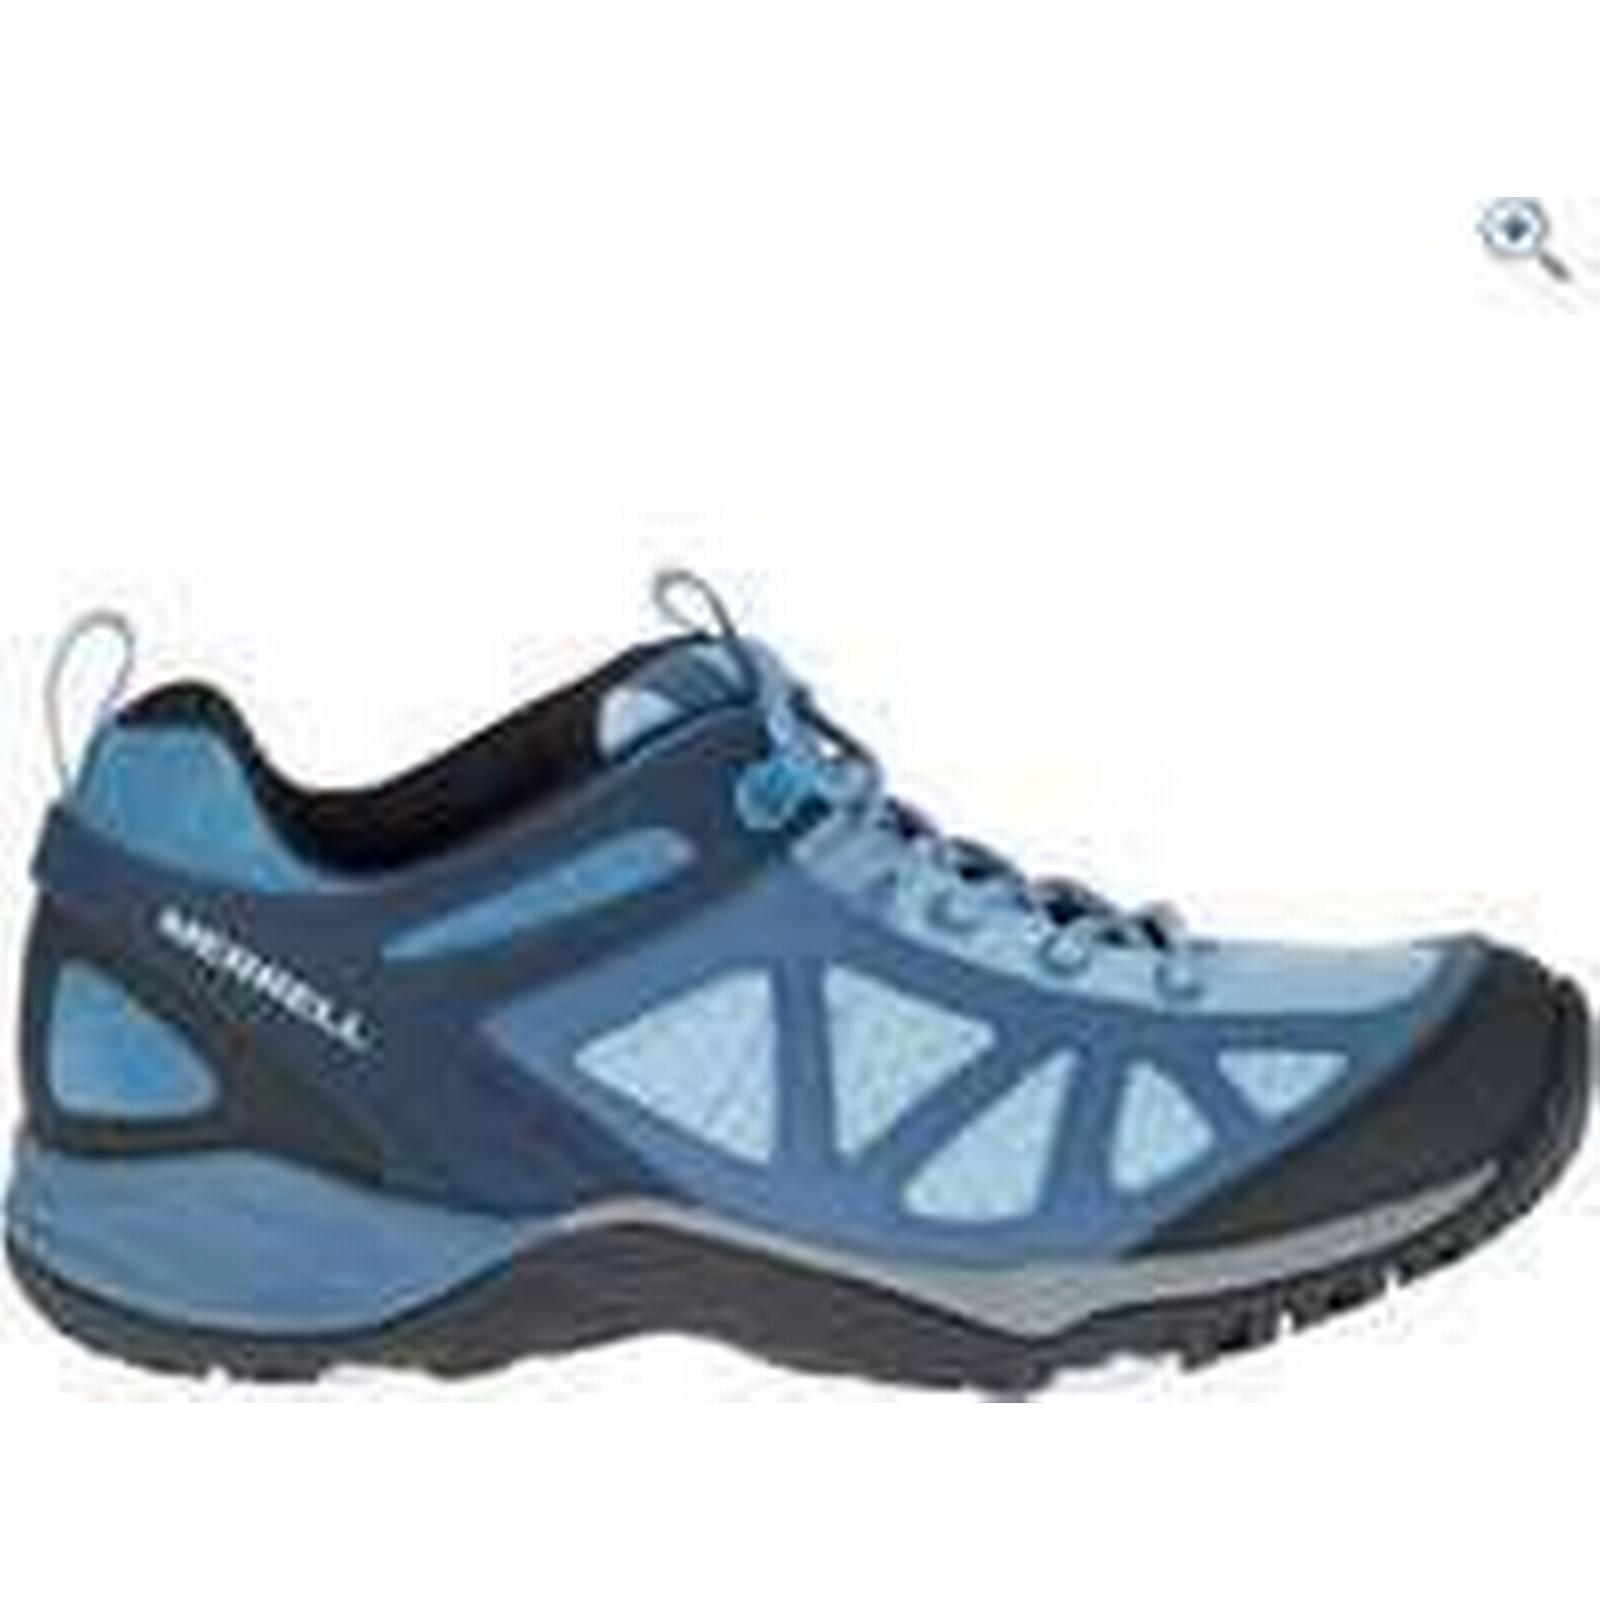 Merrell Hiking Women's Siren Sport Q2 Hiking Merrell Shoes - Size: 7 - Colour: Blue 7af064